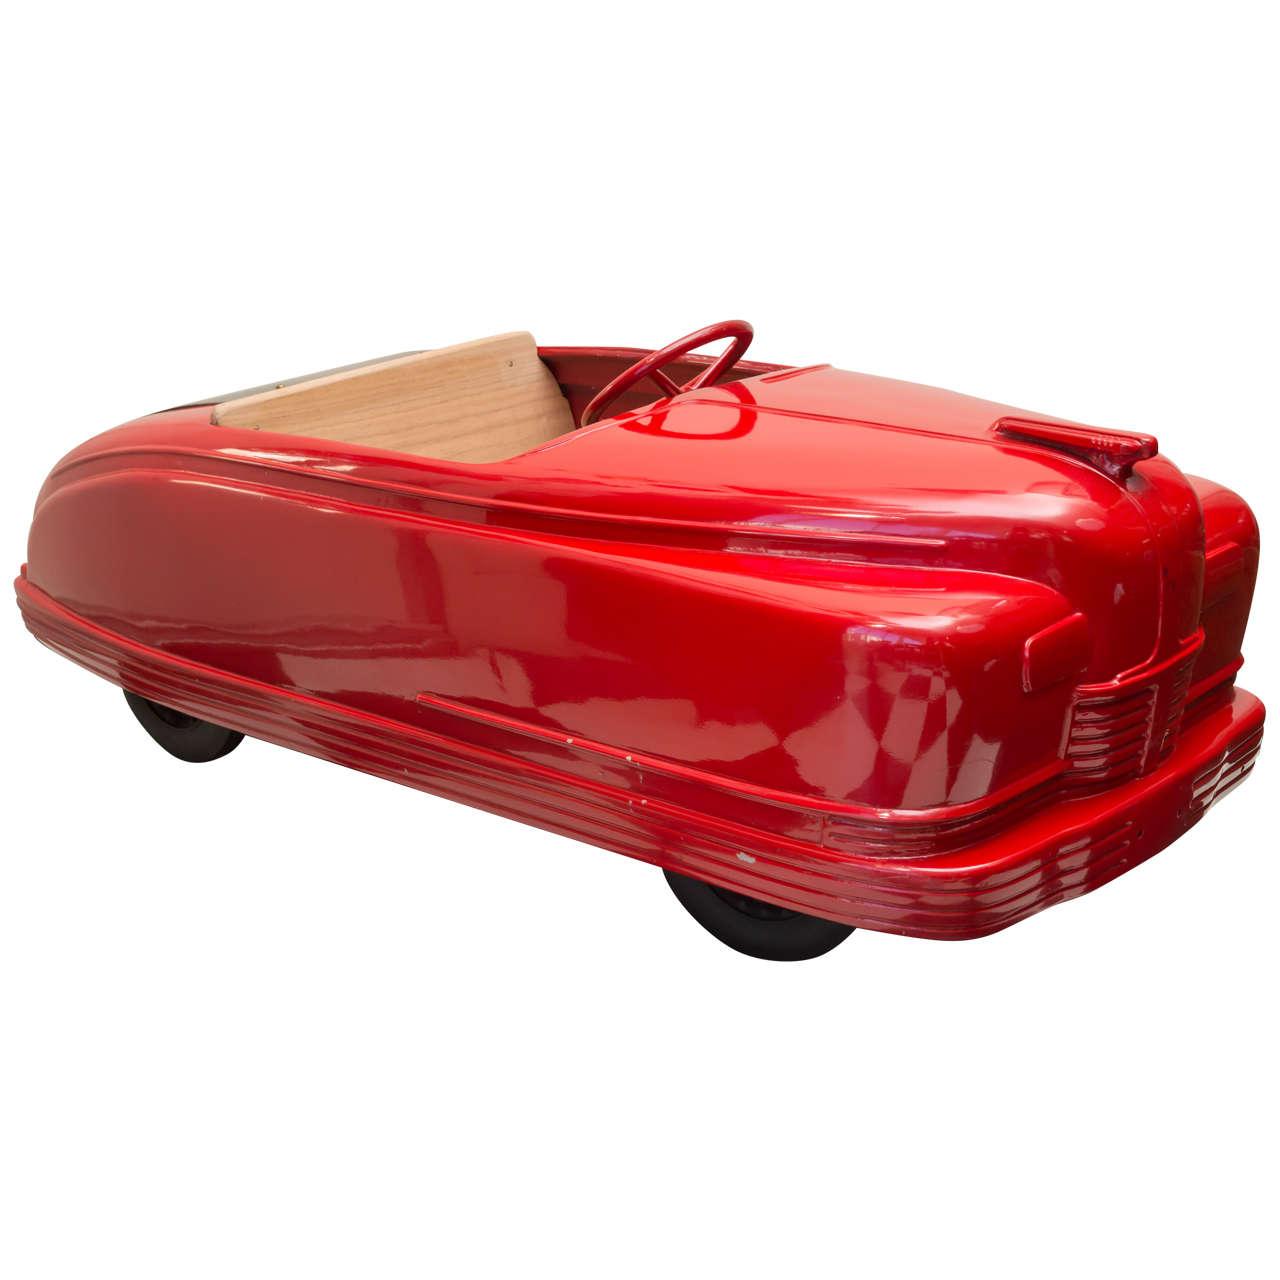 "Late 1940s American Amusement Park Car, ""Little Red Convertible"""